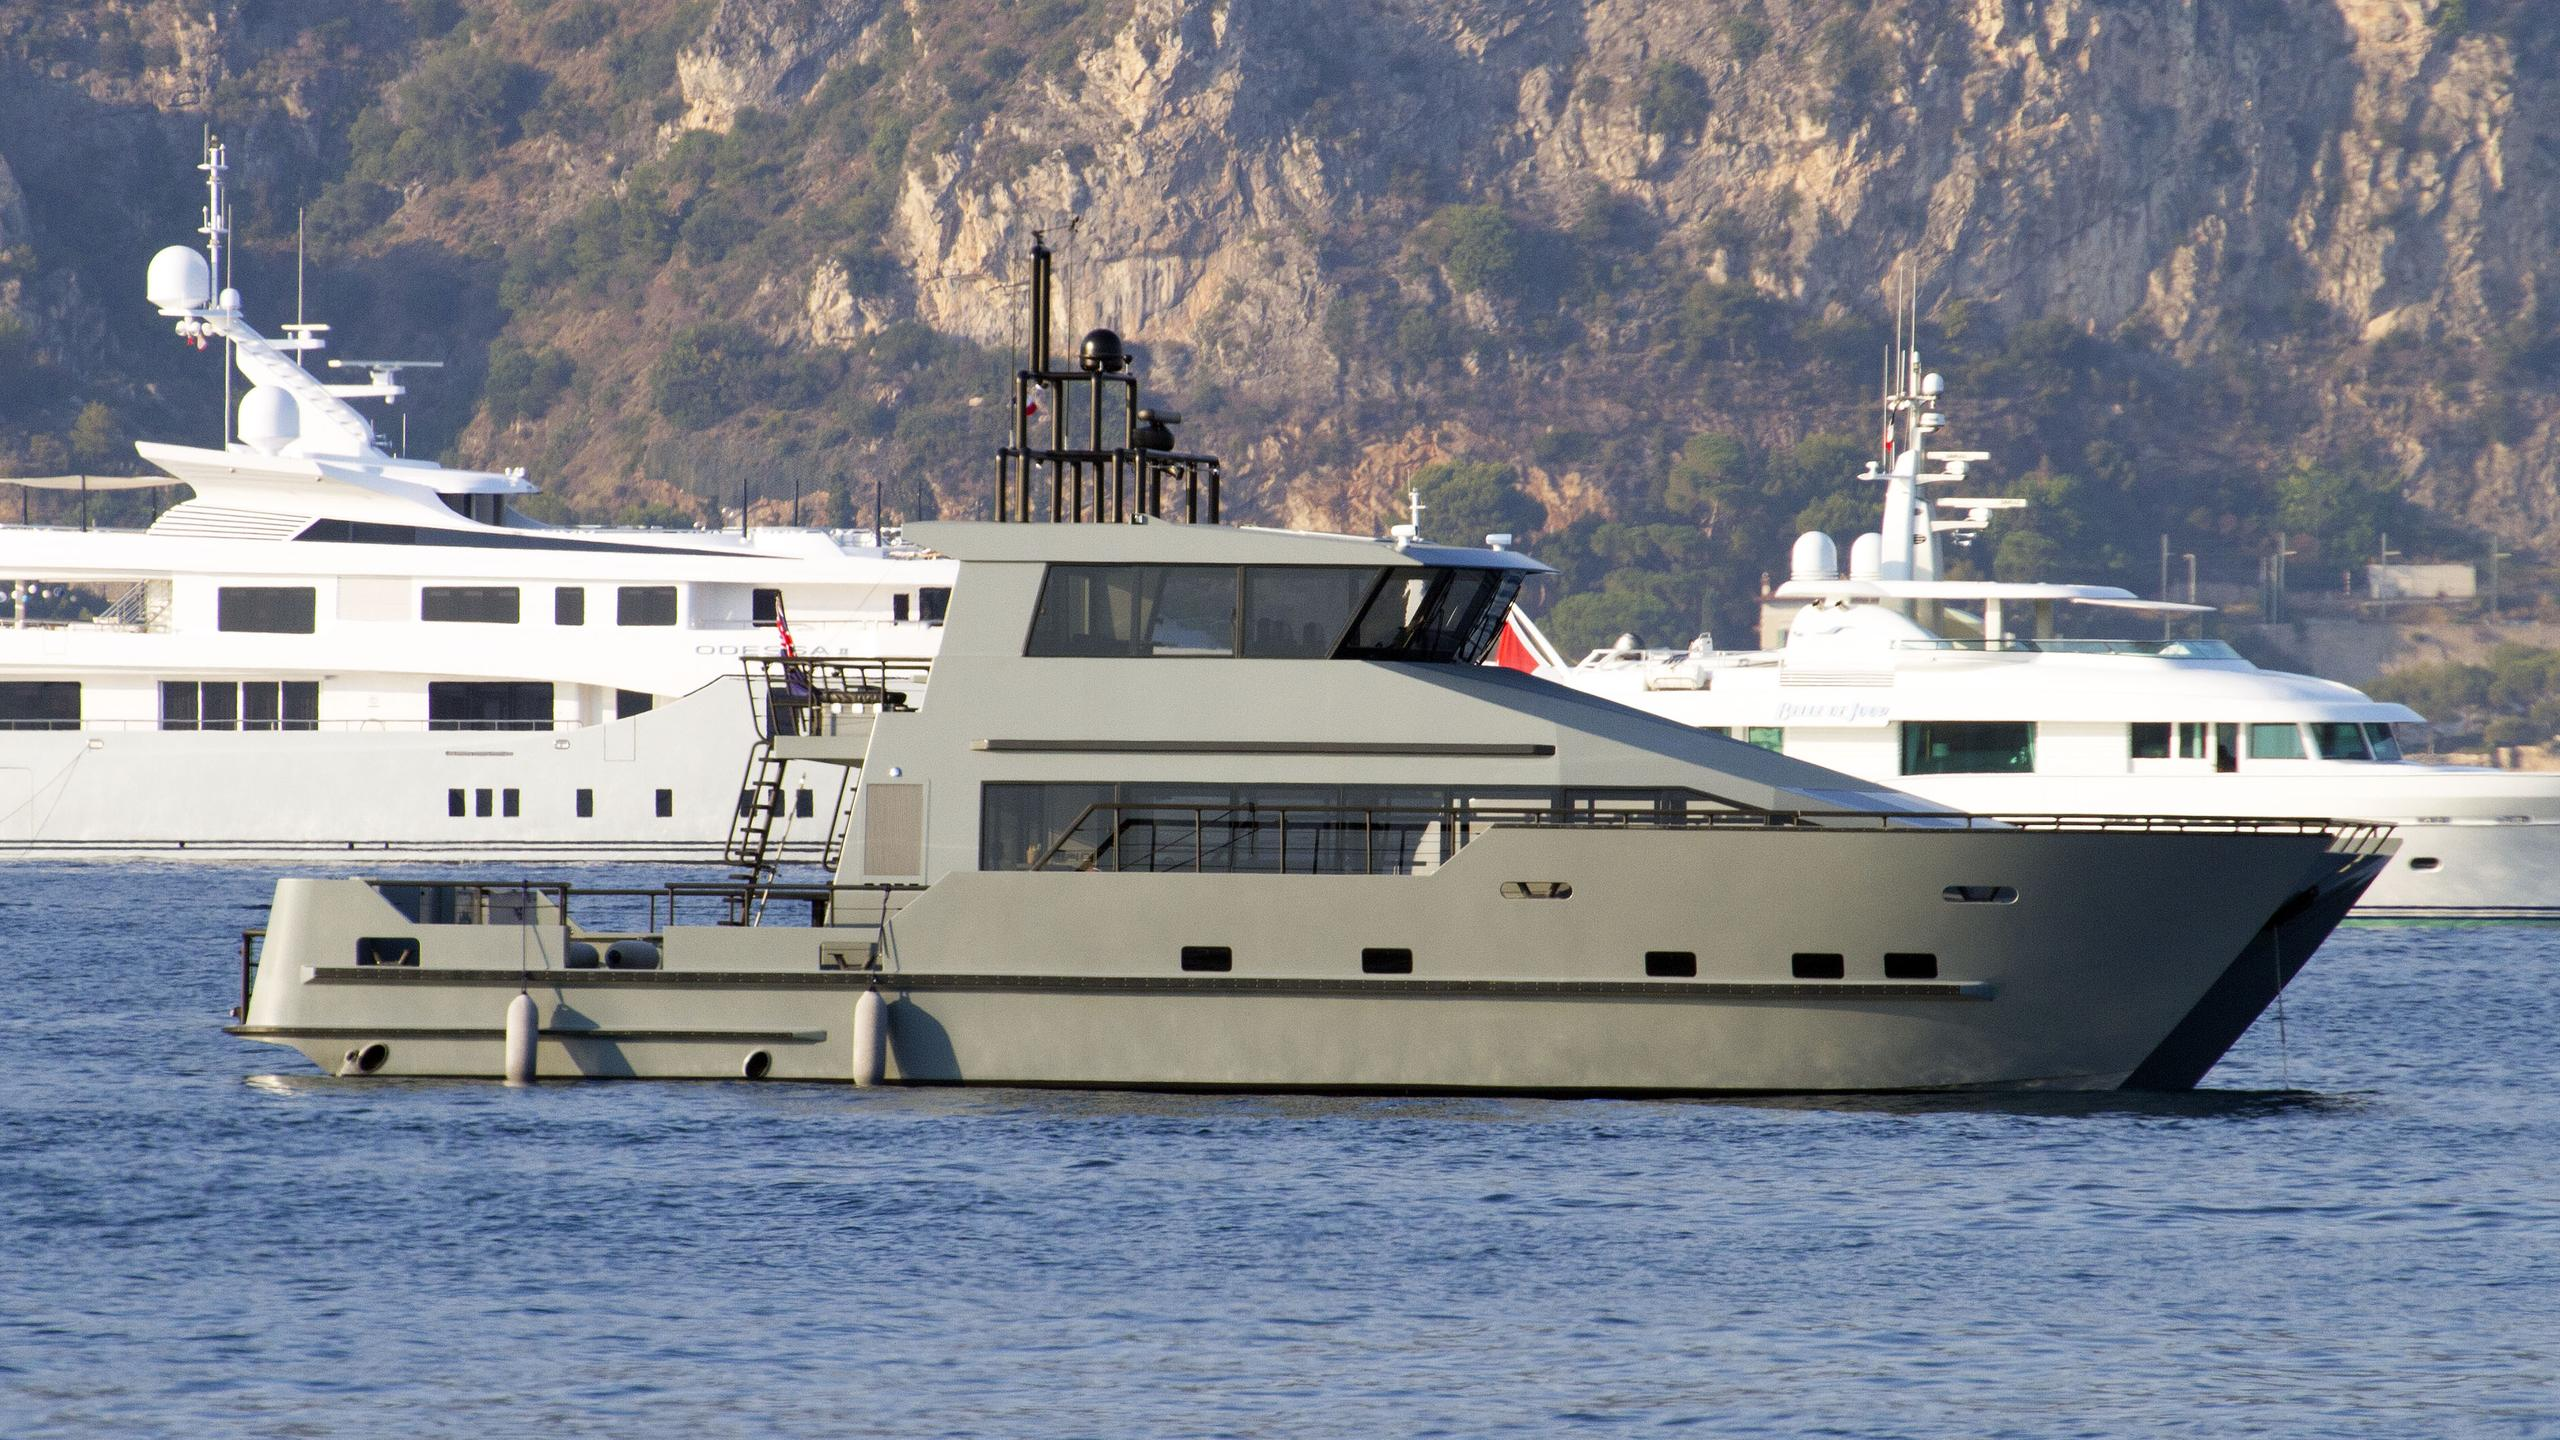 andromeda-ulysses-explorer-yacht-kleven-2015-107m-main-tender